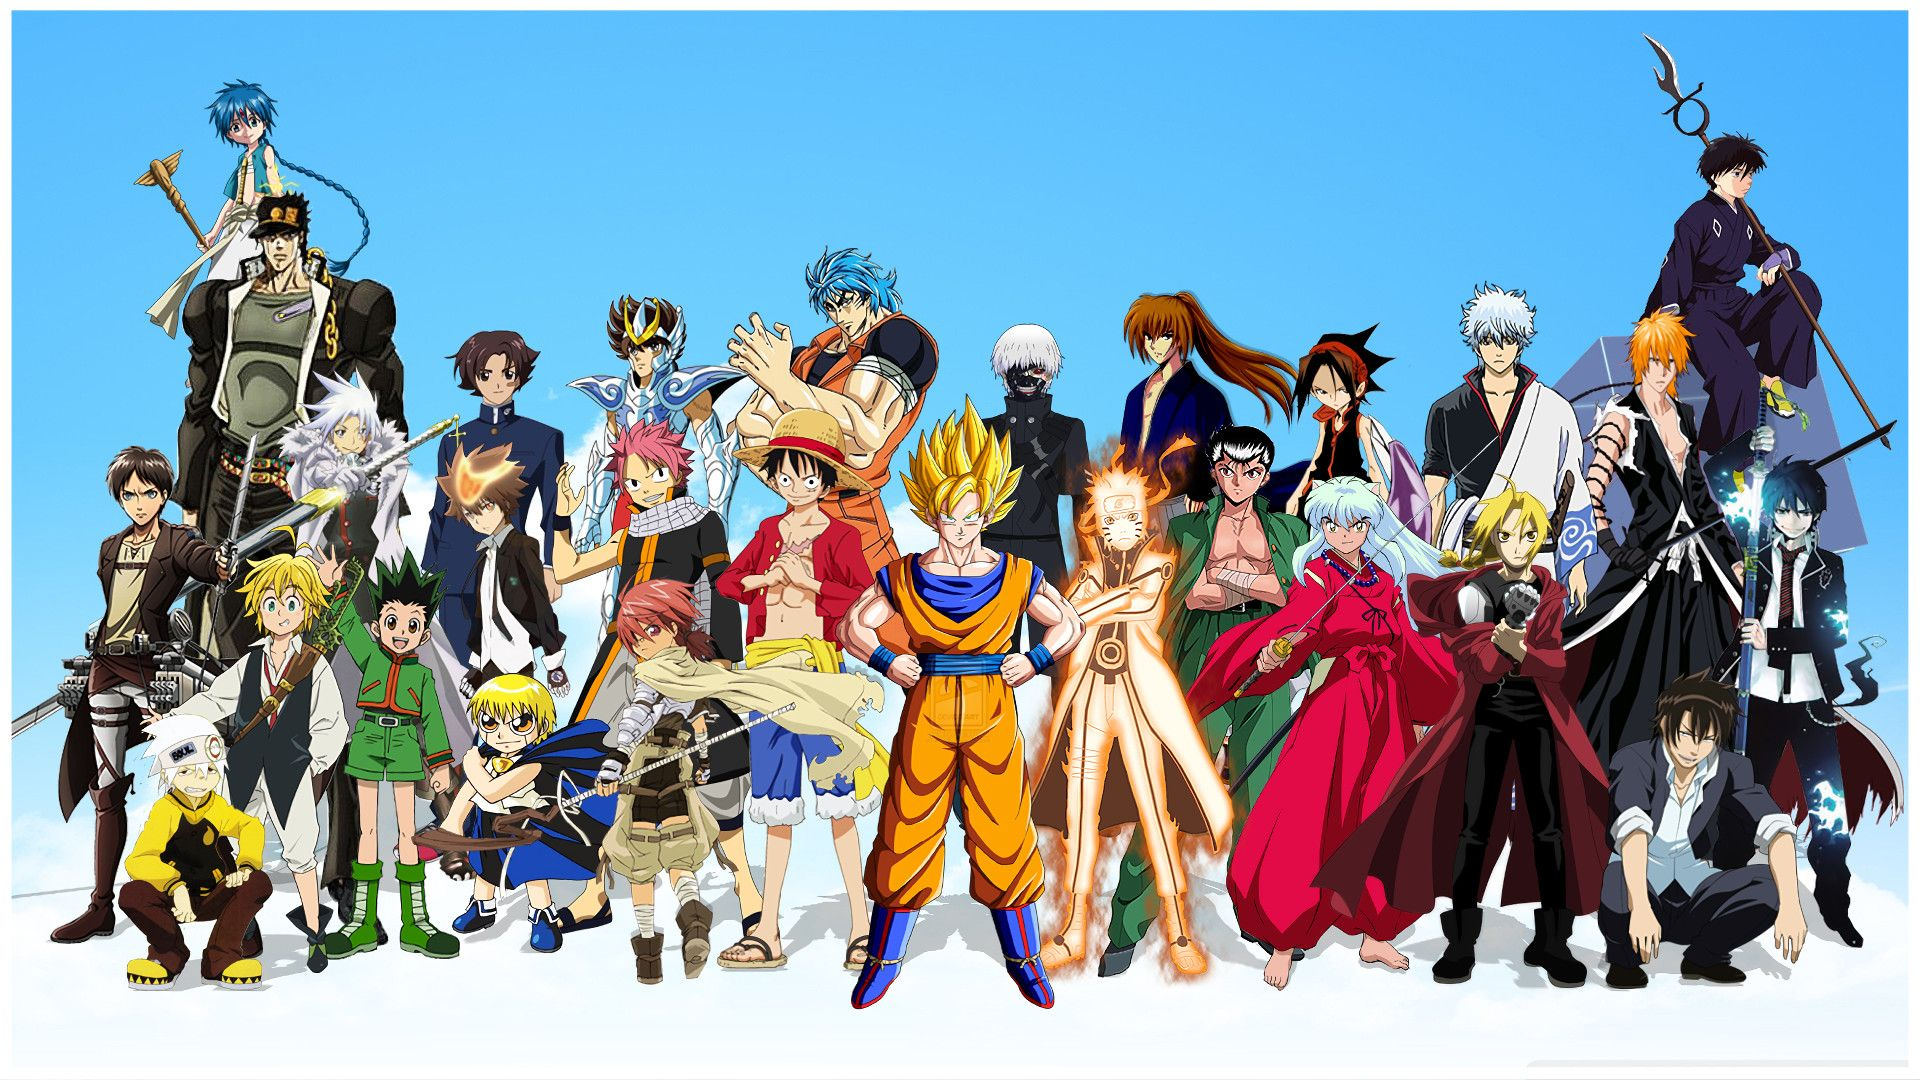 7 deadly sins anime season 1